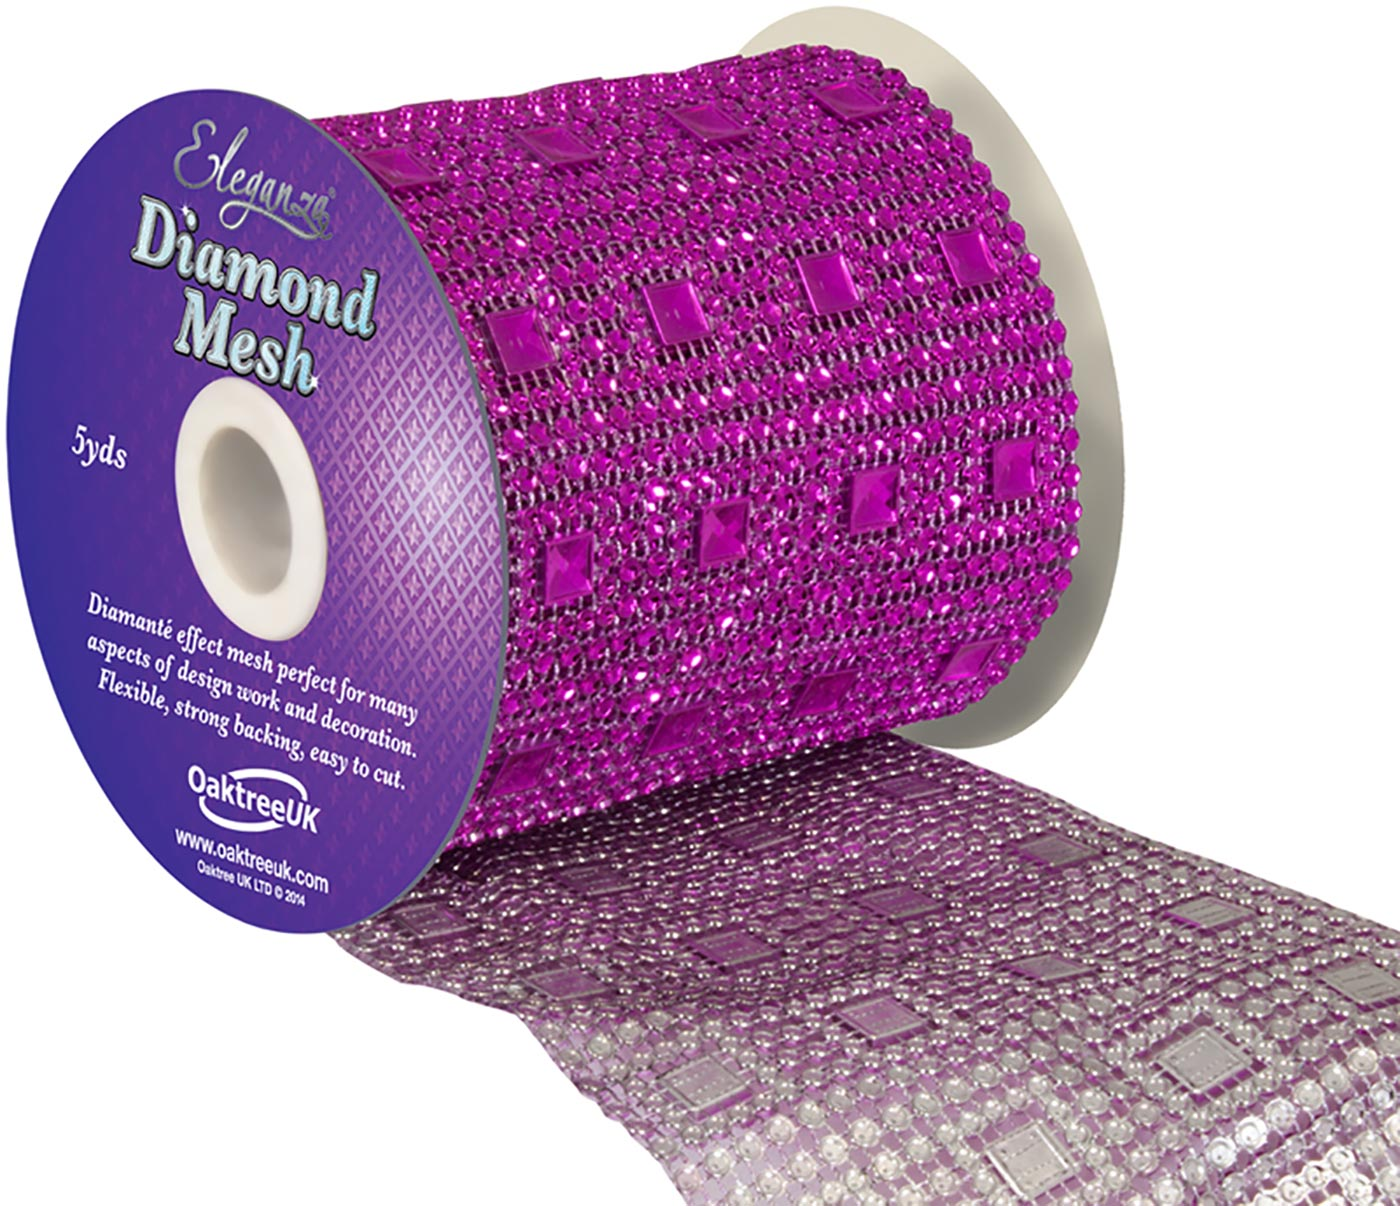 Eleganza Diamond Mesh 11cm x 4.5m Pattern No.351 Fuchsia